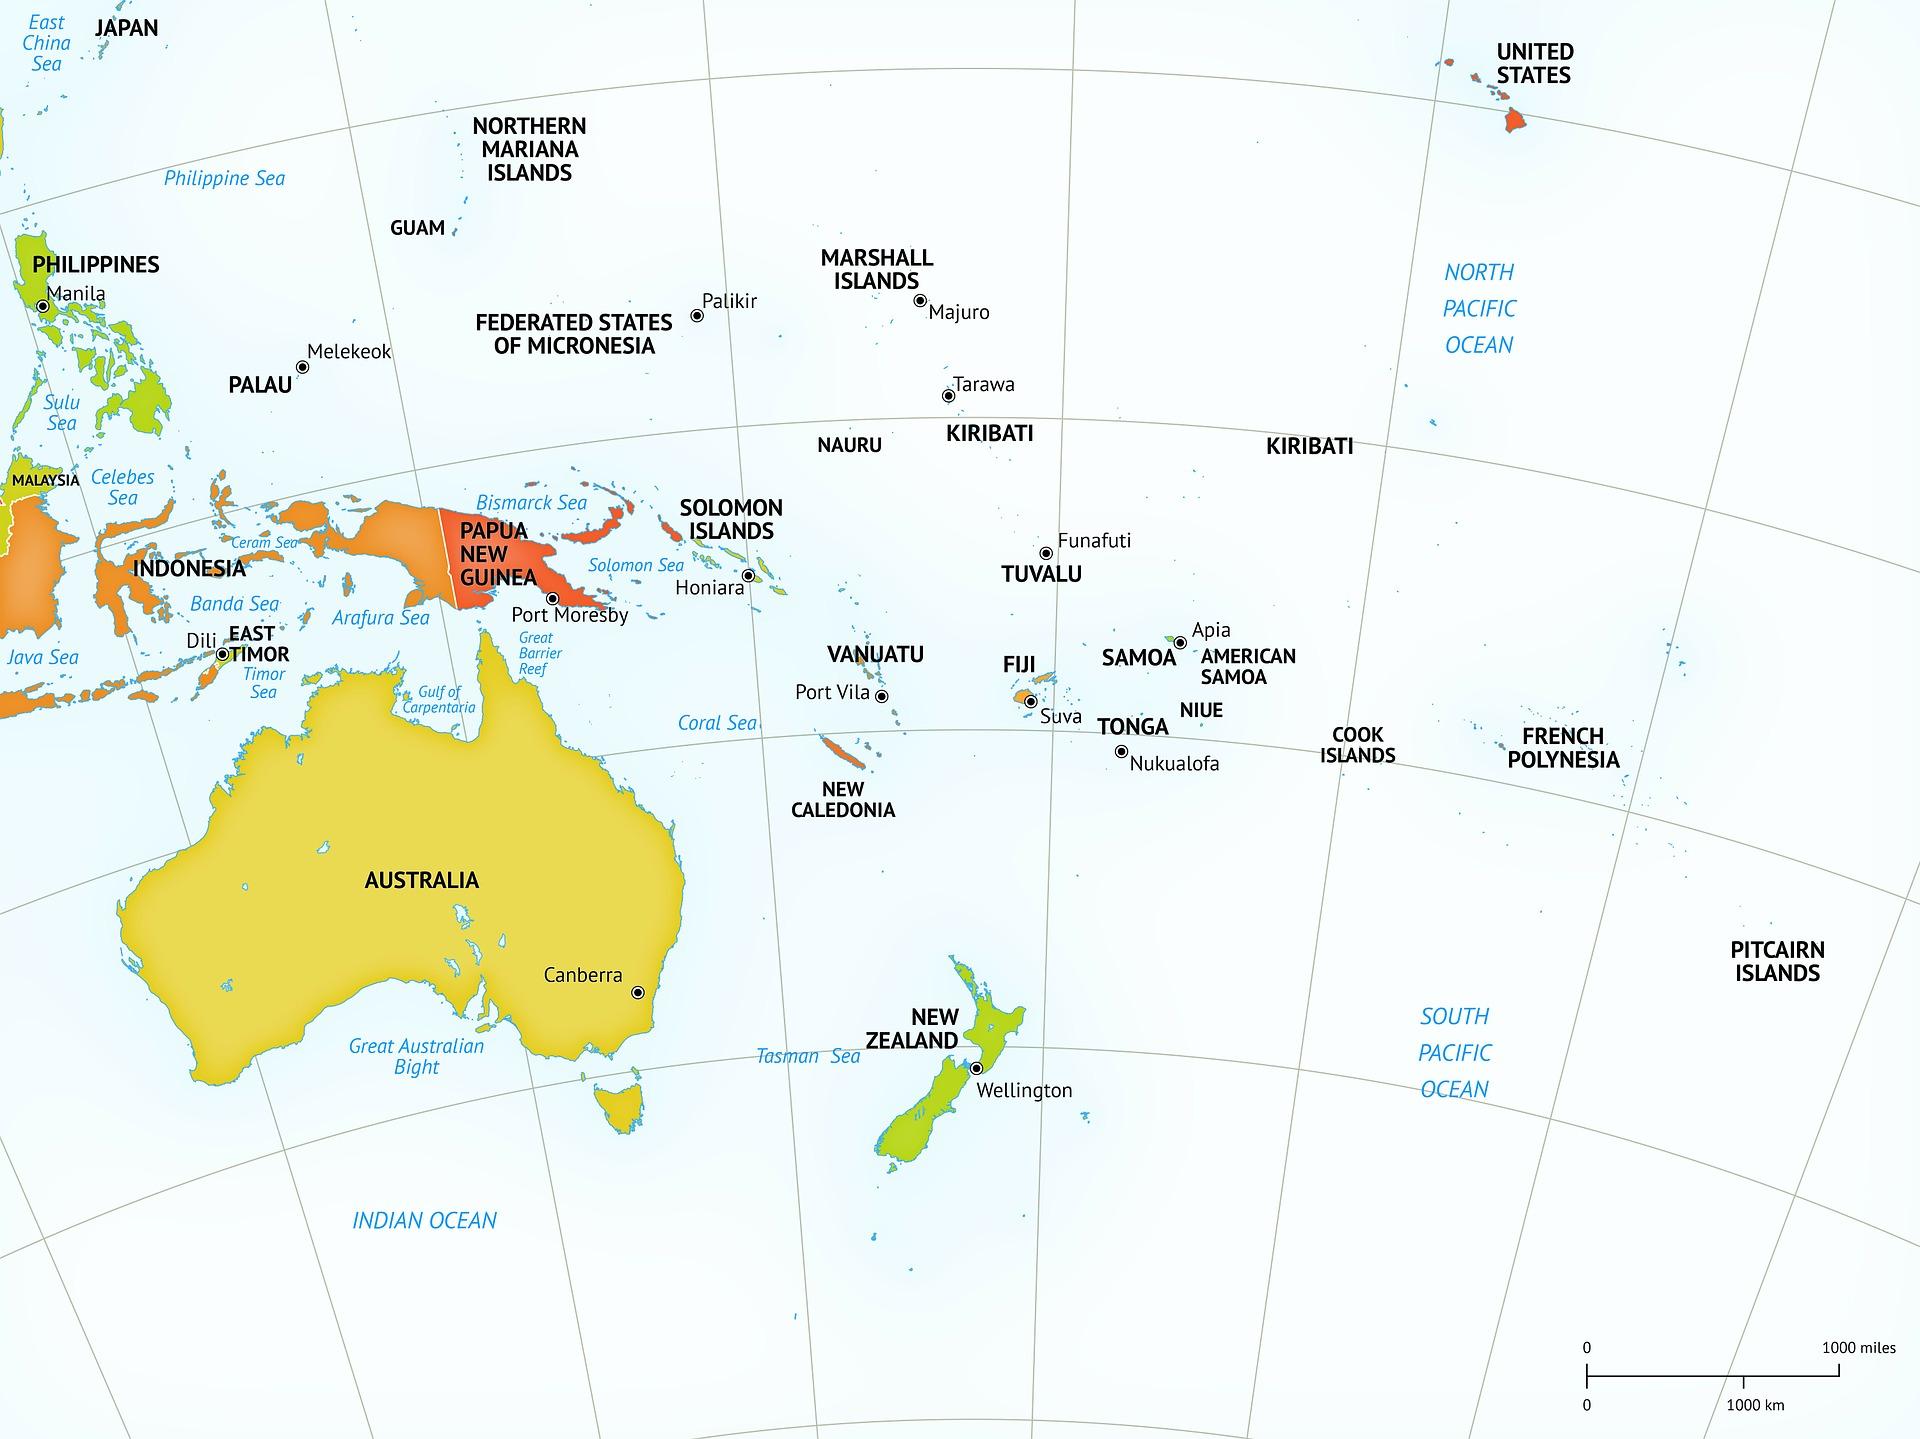 Mappa dell'Australia e Nuova Zelanda